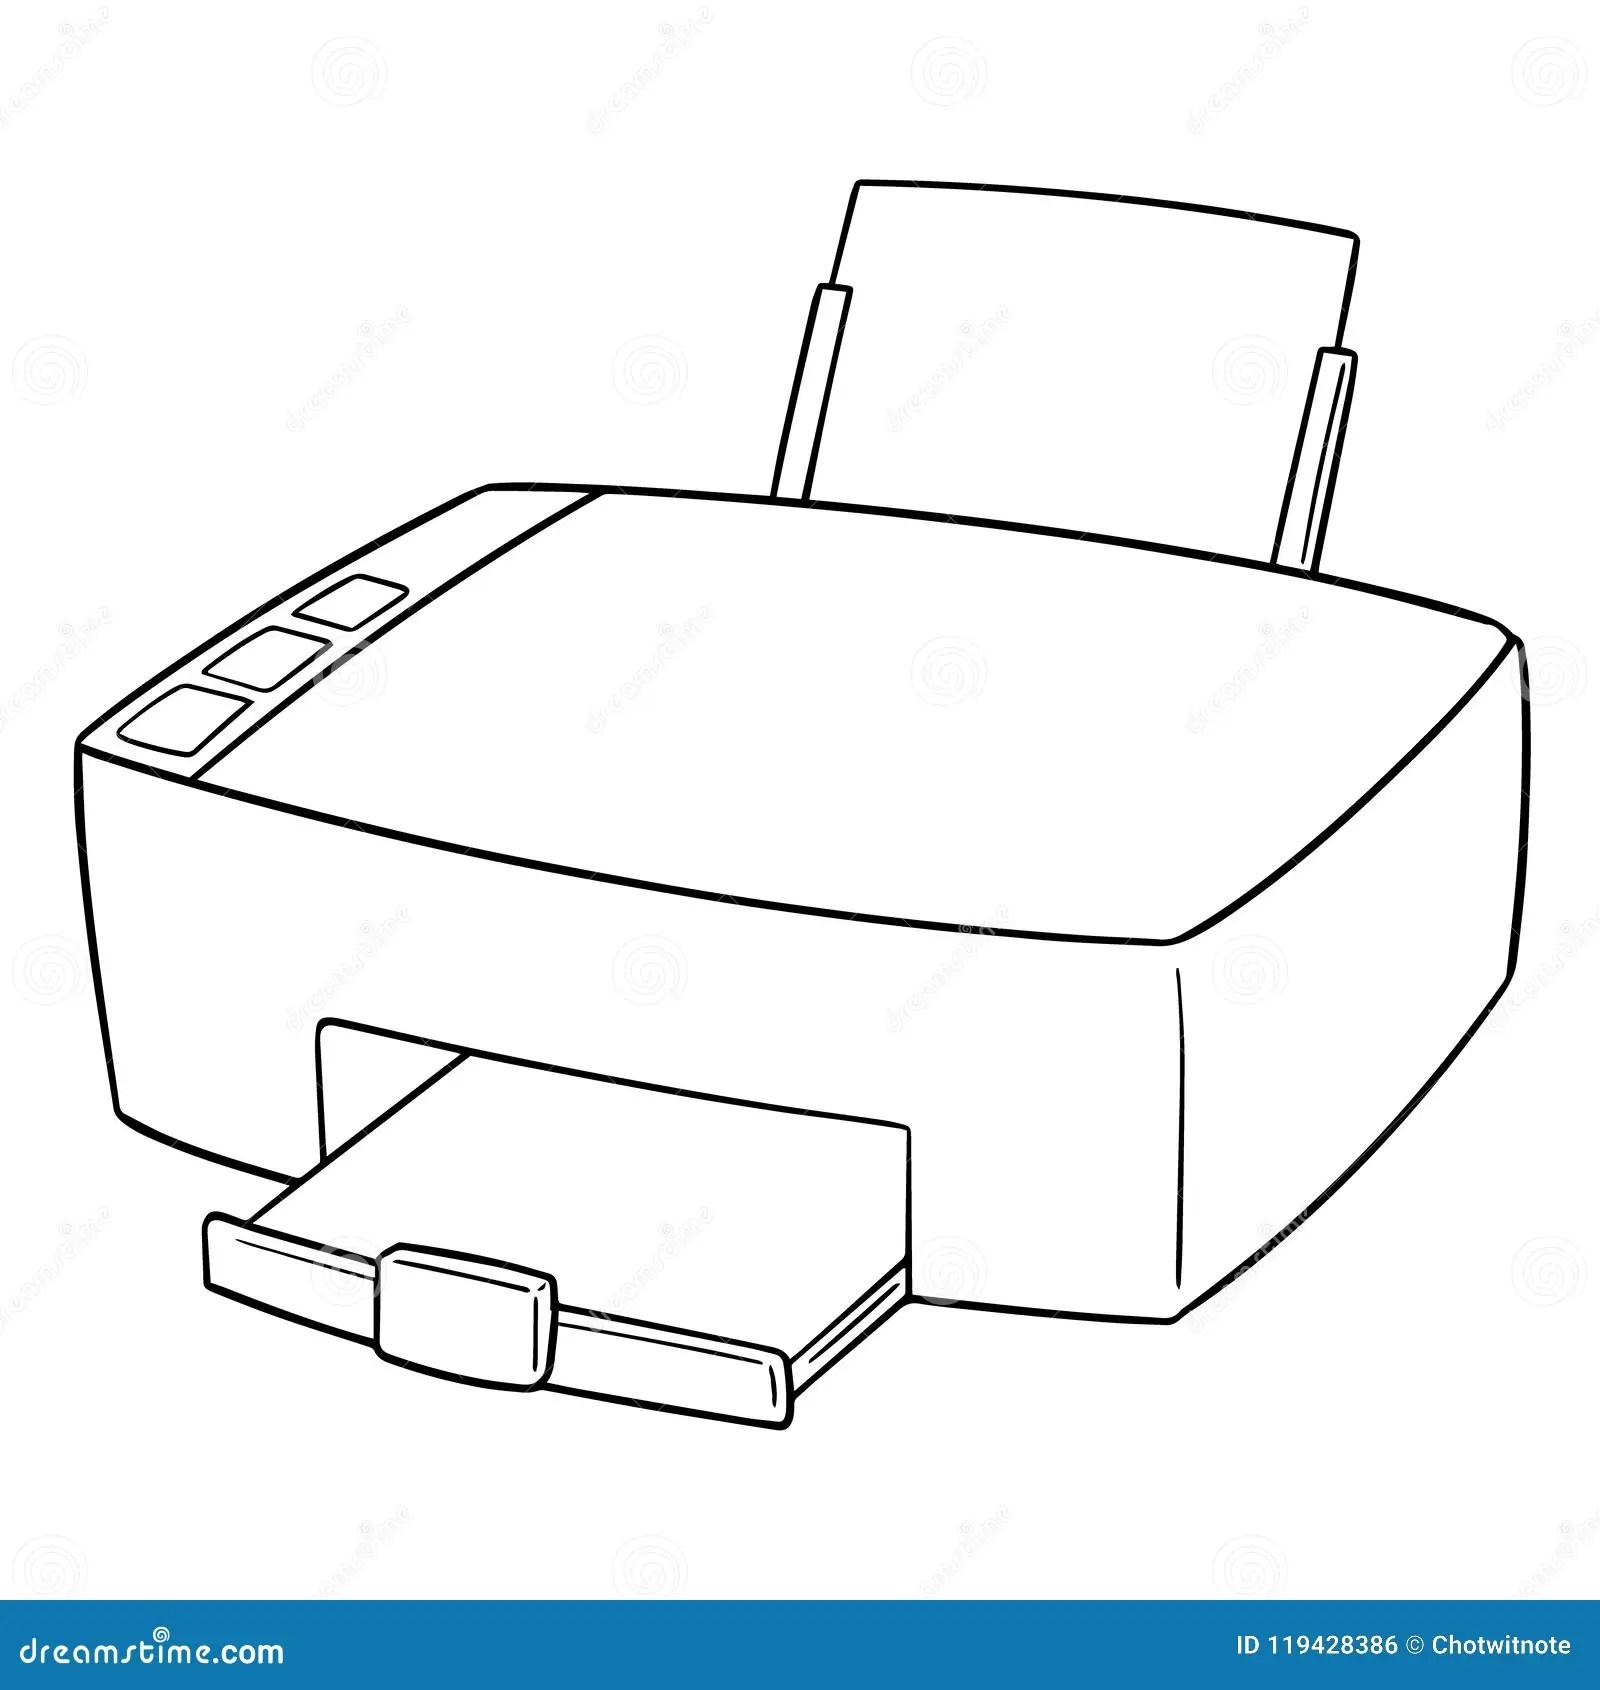 vector of printer stock vector illustration of draw